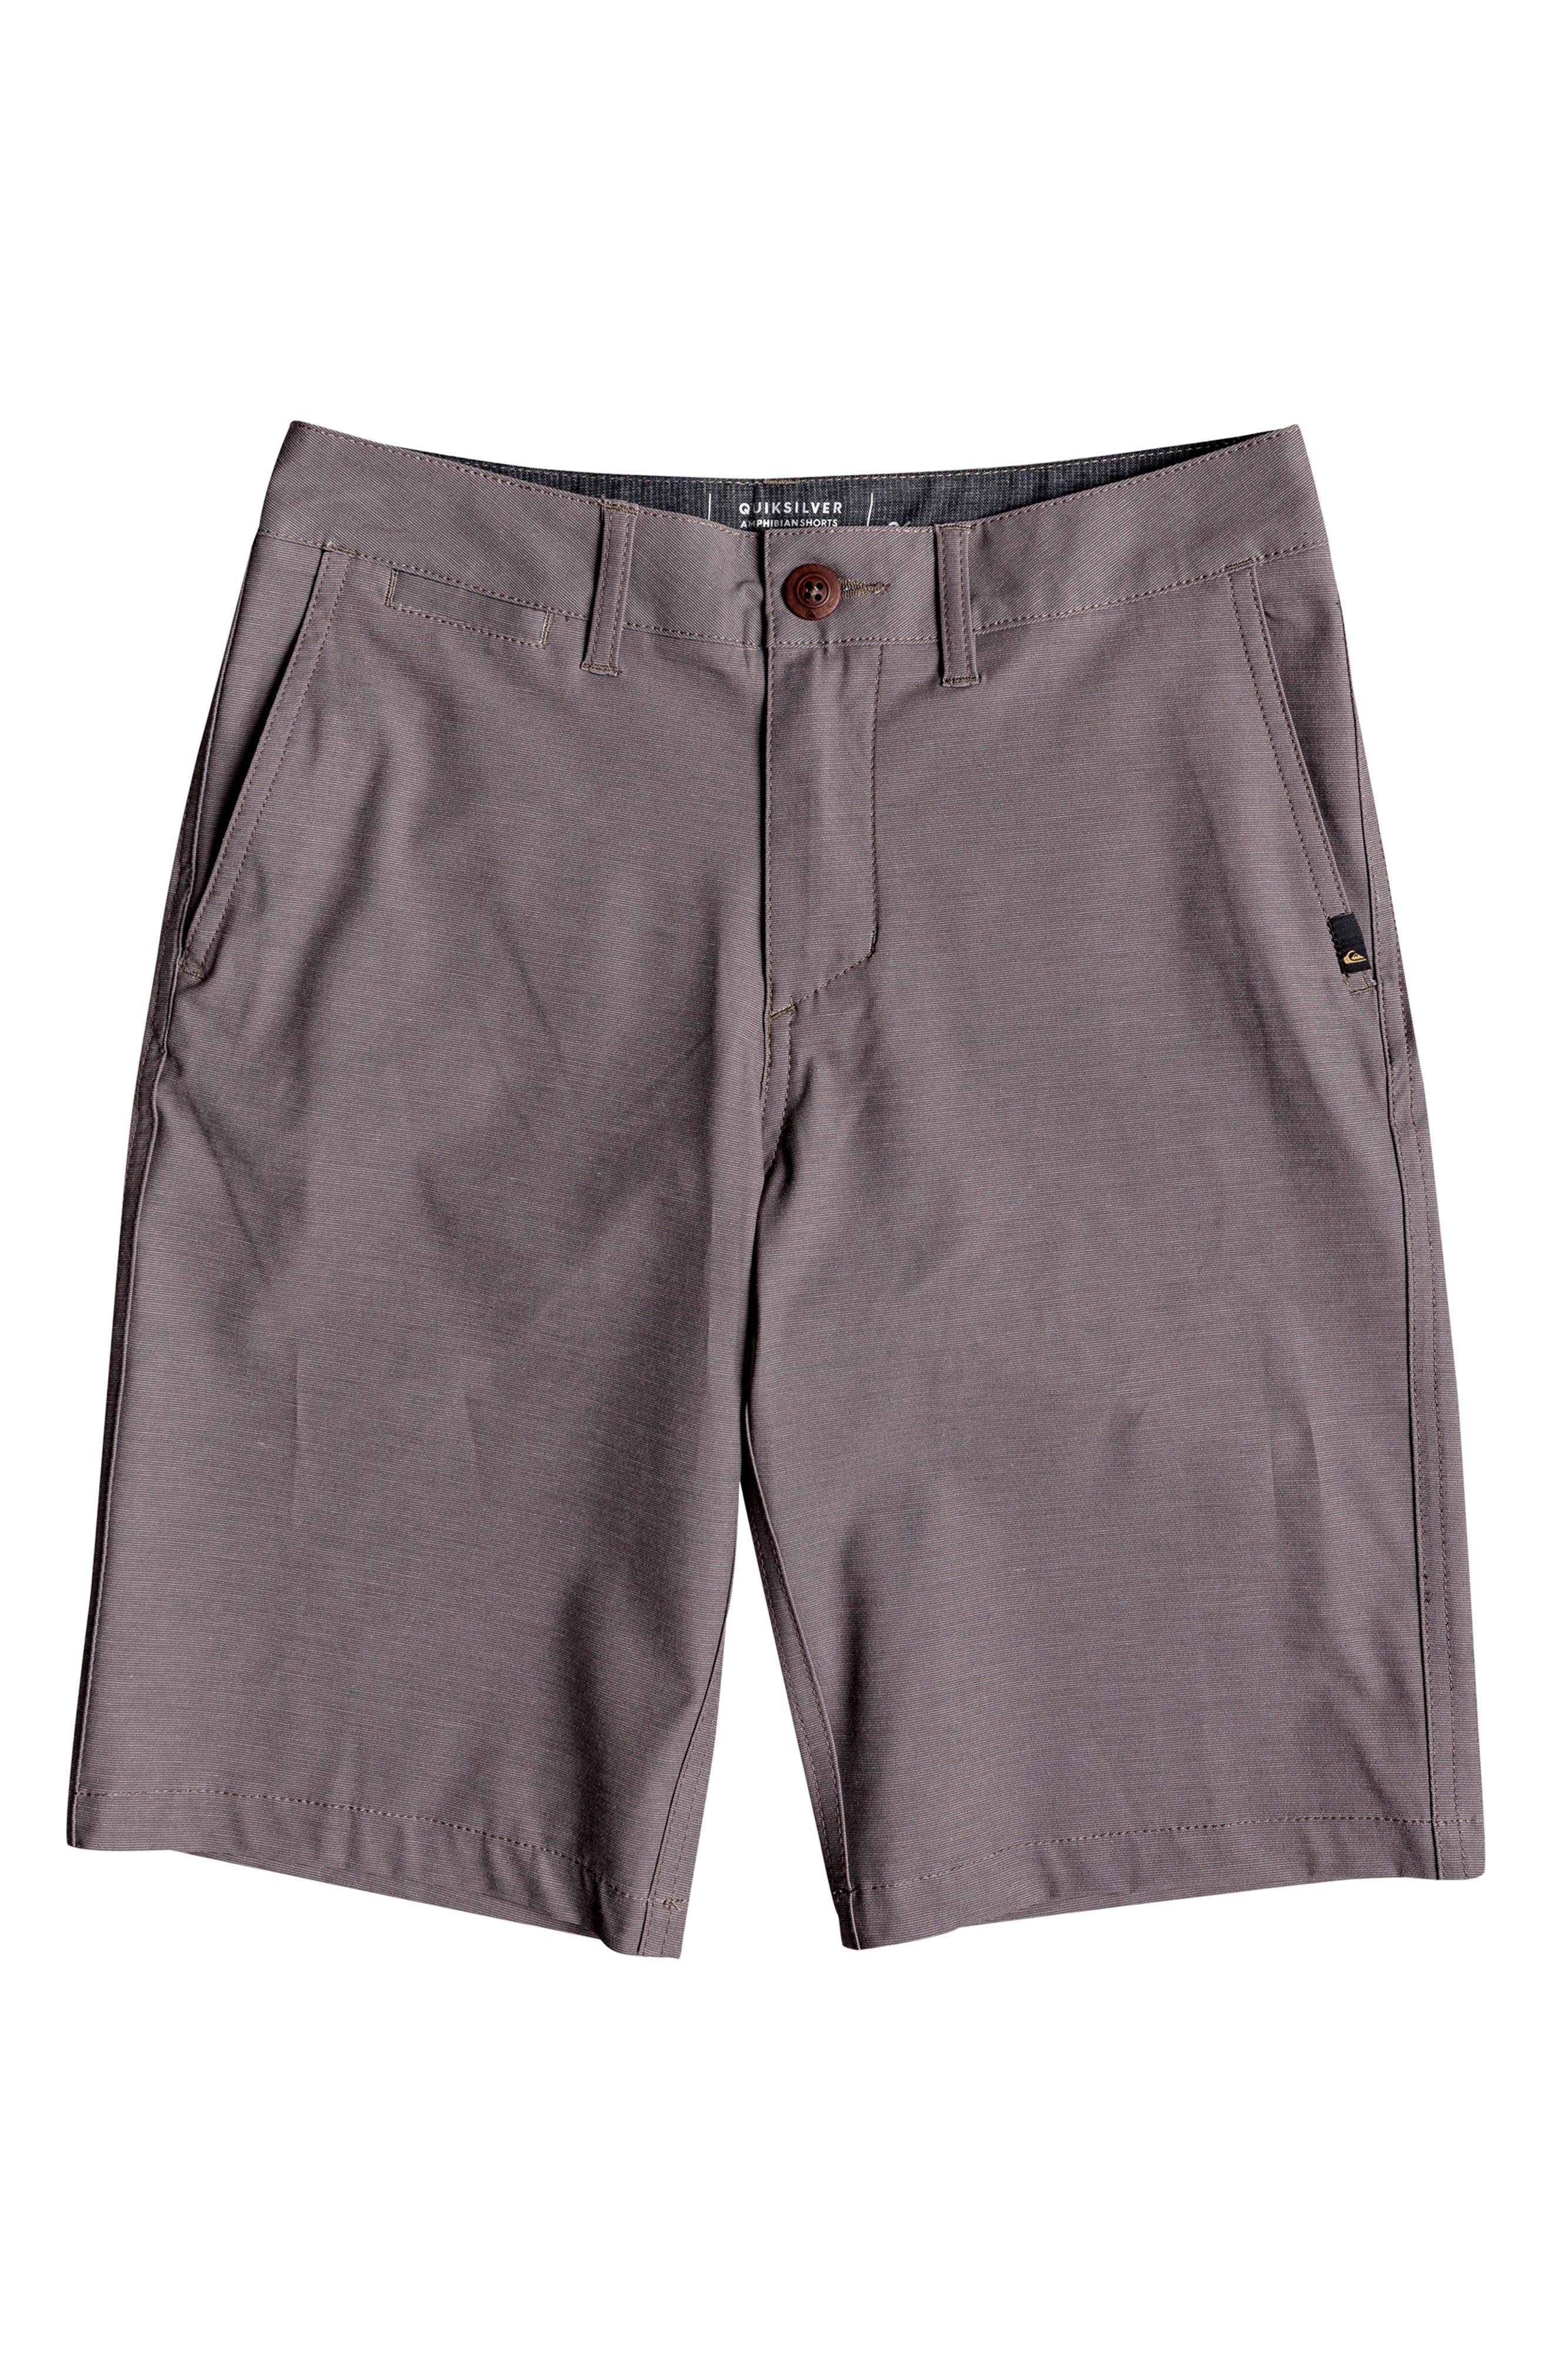 Union Heather Amphibian Hybrid Shorts,                             Main thumbnail 1, color,                             FALCON